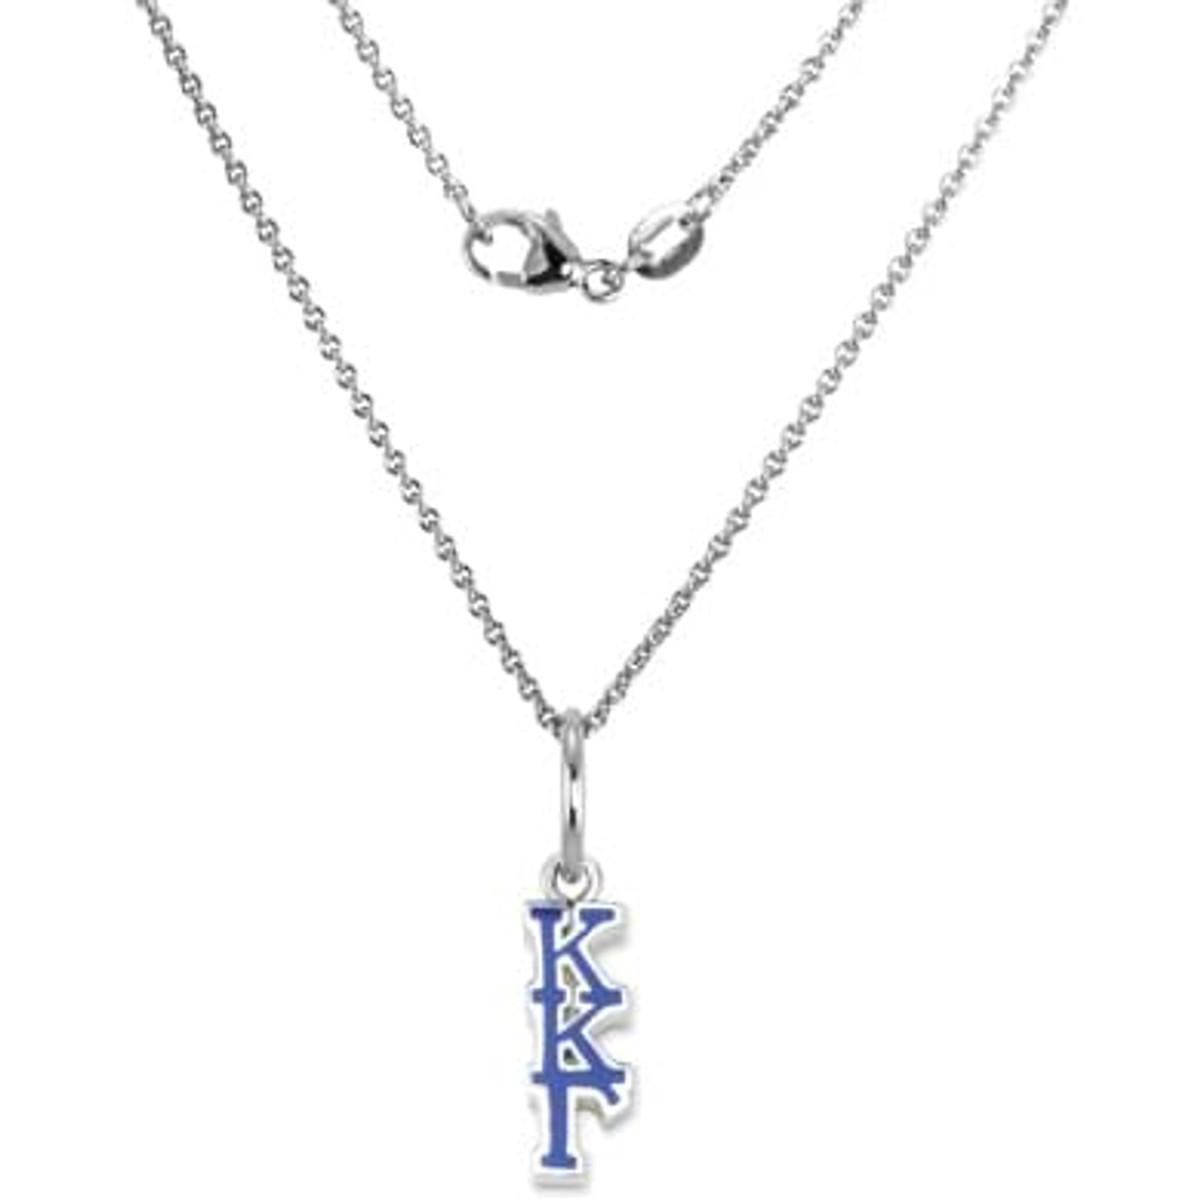 Kappa Kappa Gamma Sterling Silver Necklace with Greek